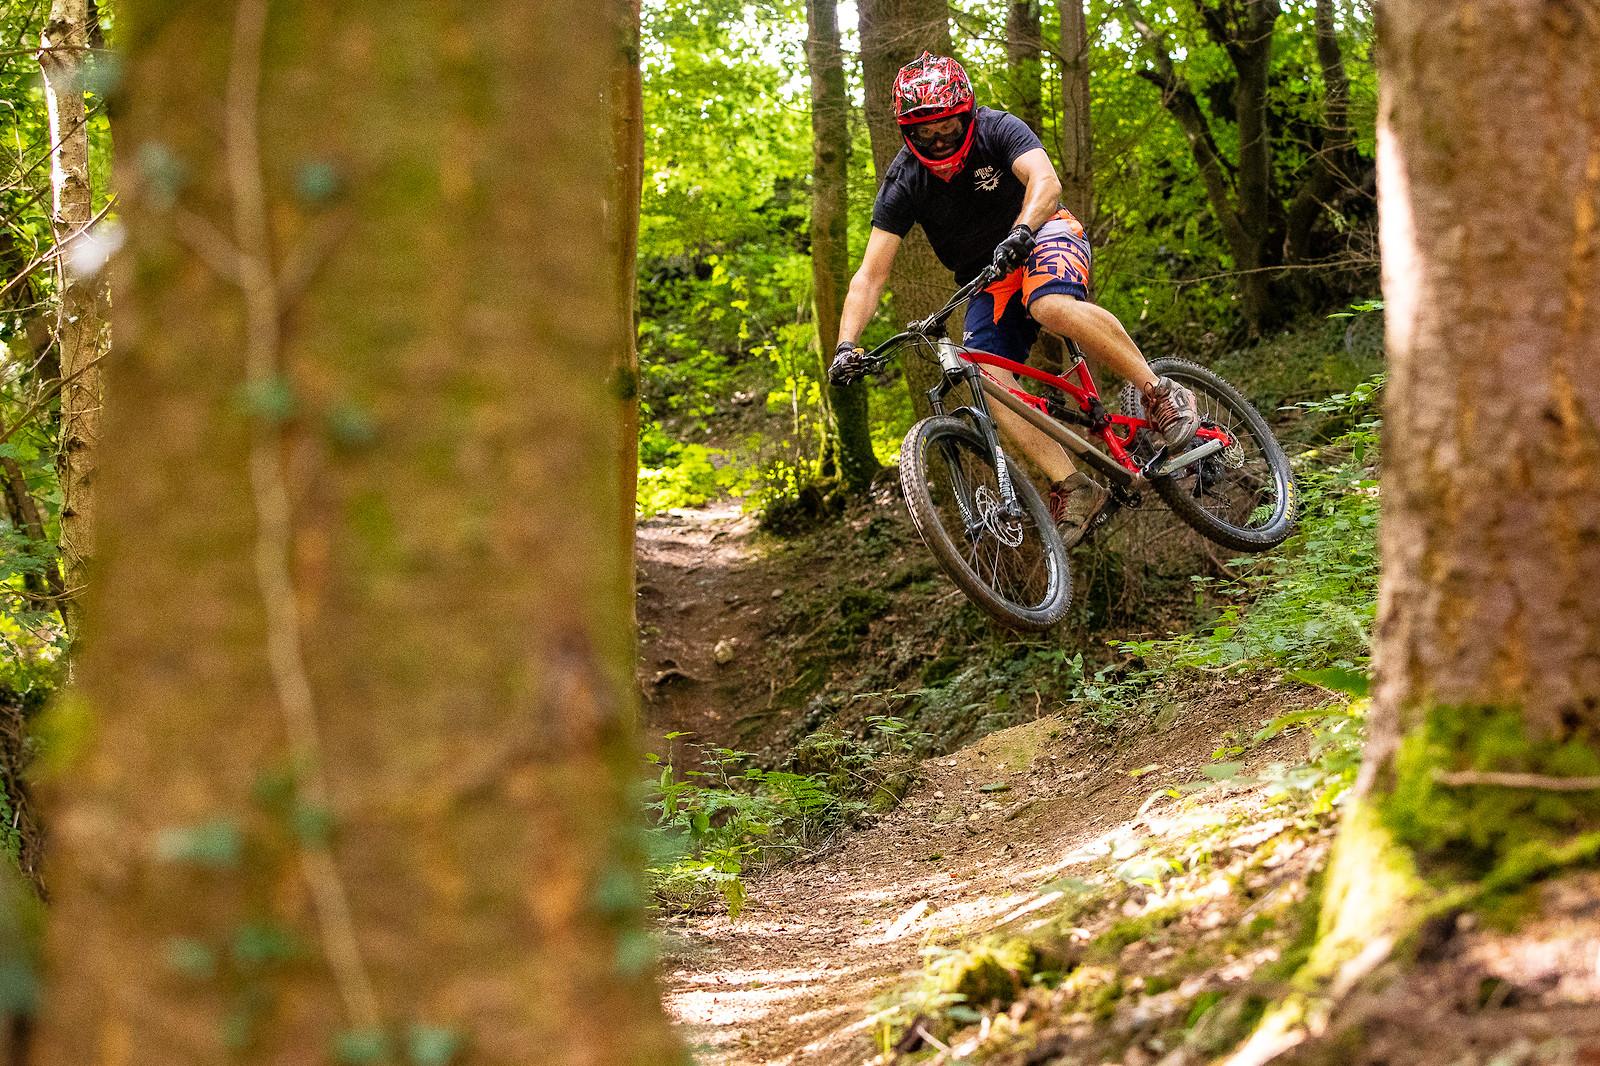 Welsh Whip - Robert_Loughlin - Mountain Biking Pictures - Vital MTB